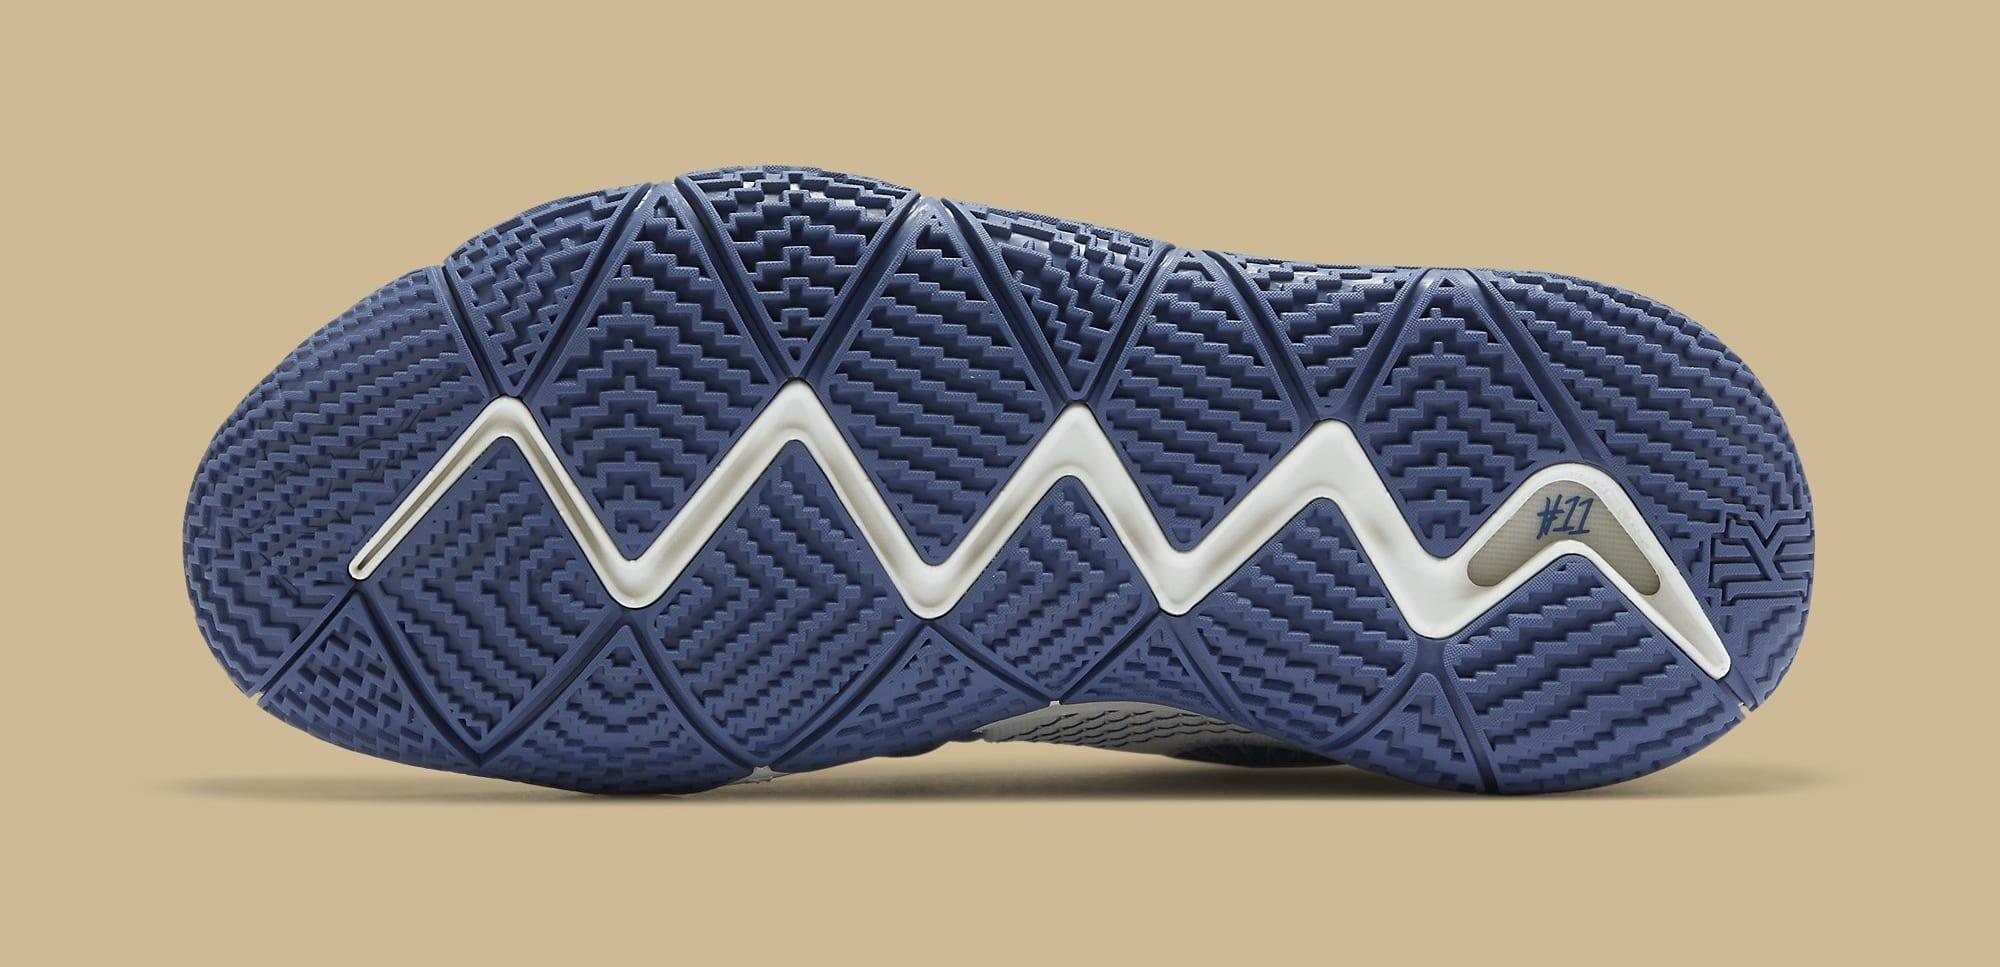 Nike Kyrie S2 Kybrid 'Sashiko' DA6806-100 Outsole